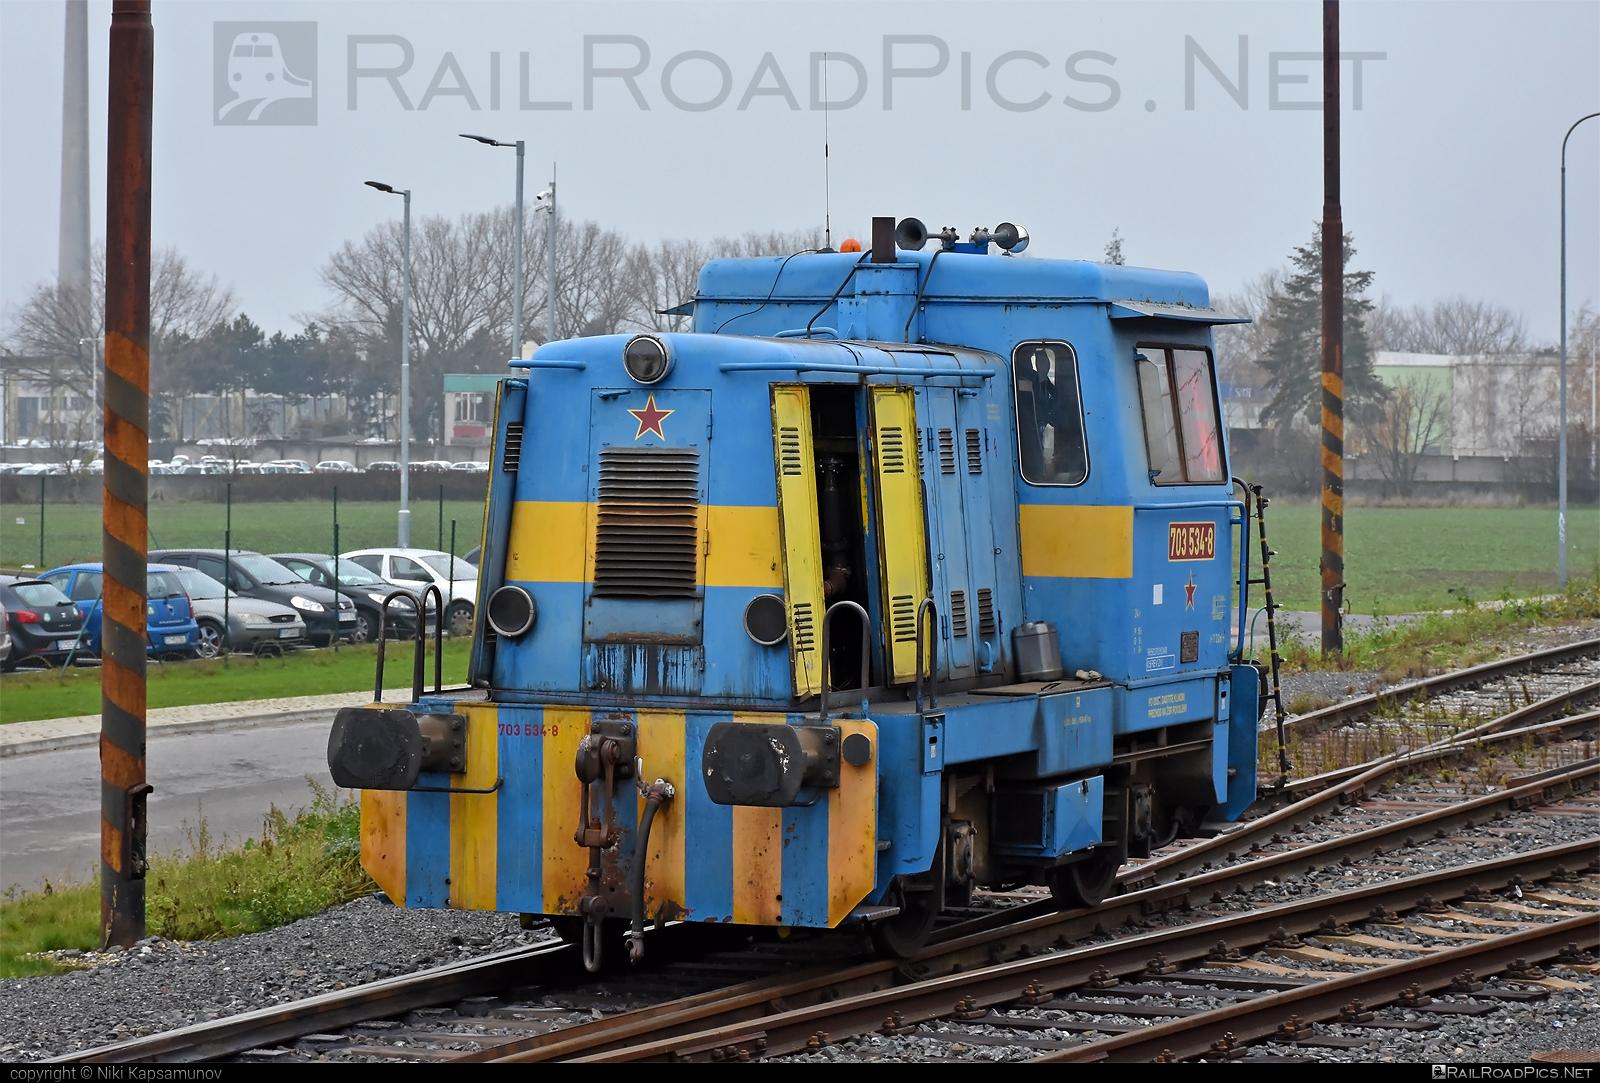 Turčianske strojárne Martin T 212.1 (703) - 703 534-8 operated by JUSO s.r.o. #locomotive703 #locomotivet2121 #prasatko #prasiatko #t2121 #turcianskestrojarnemartin